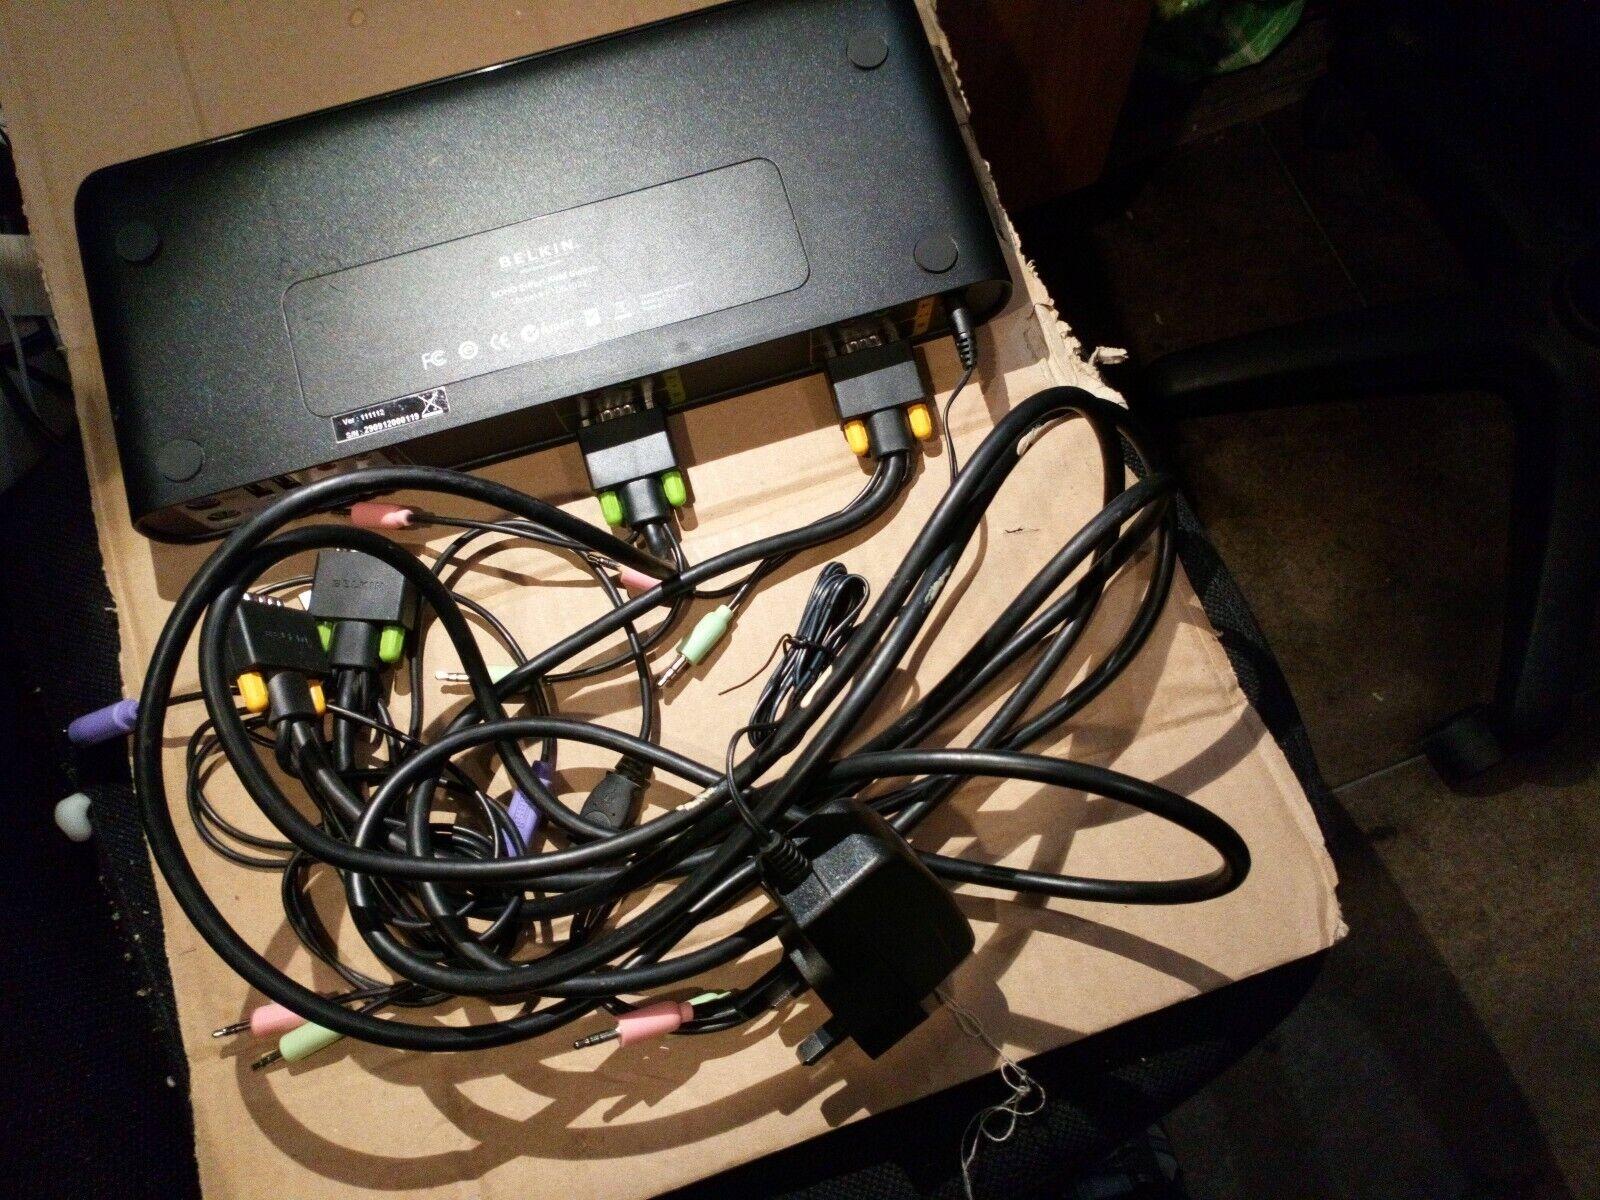 Belkin SOHO F1DS102J 2-Port VGA & Audio KVM Switch